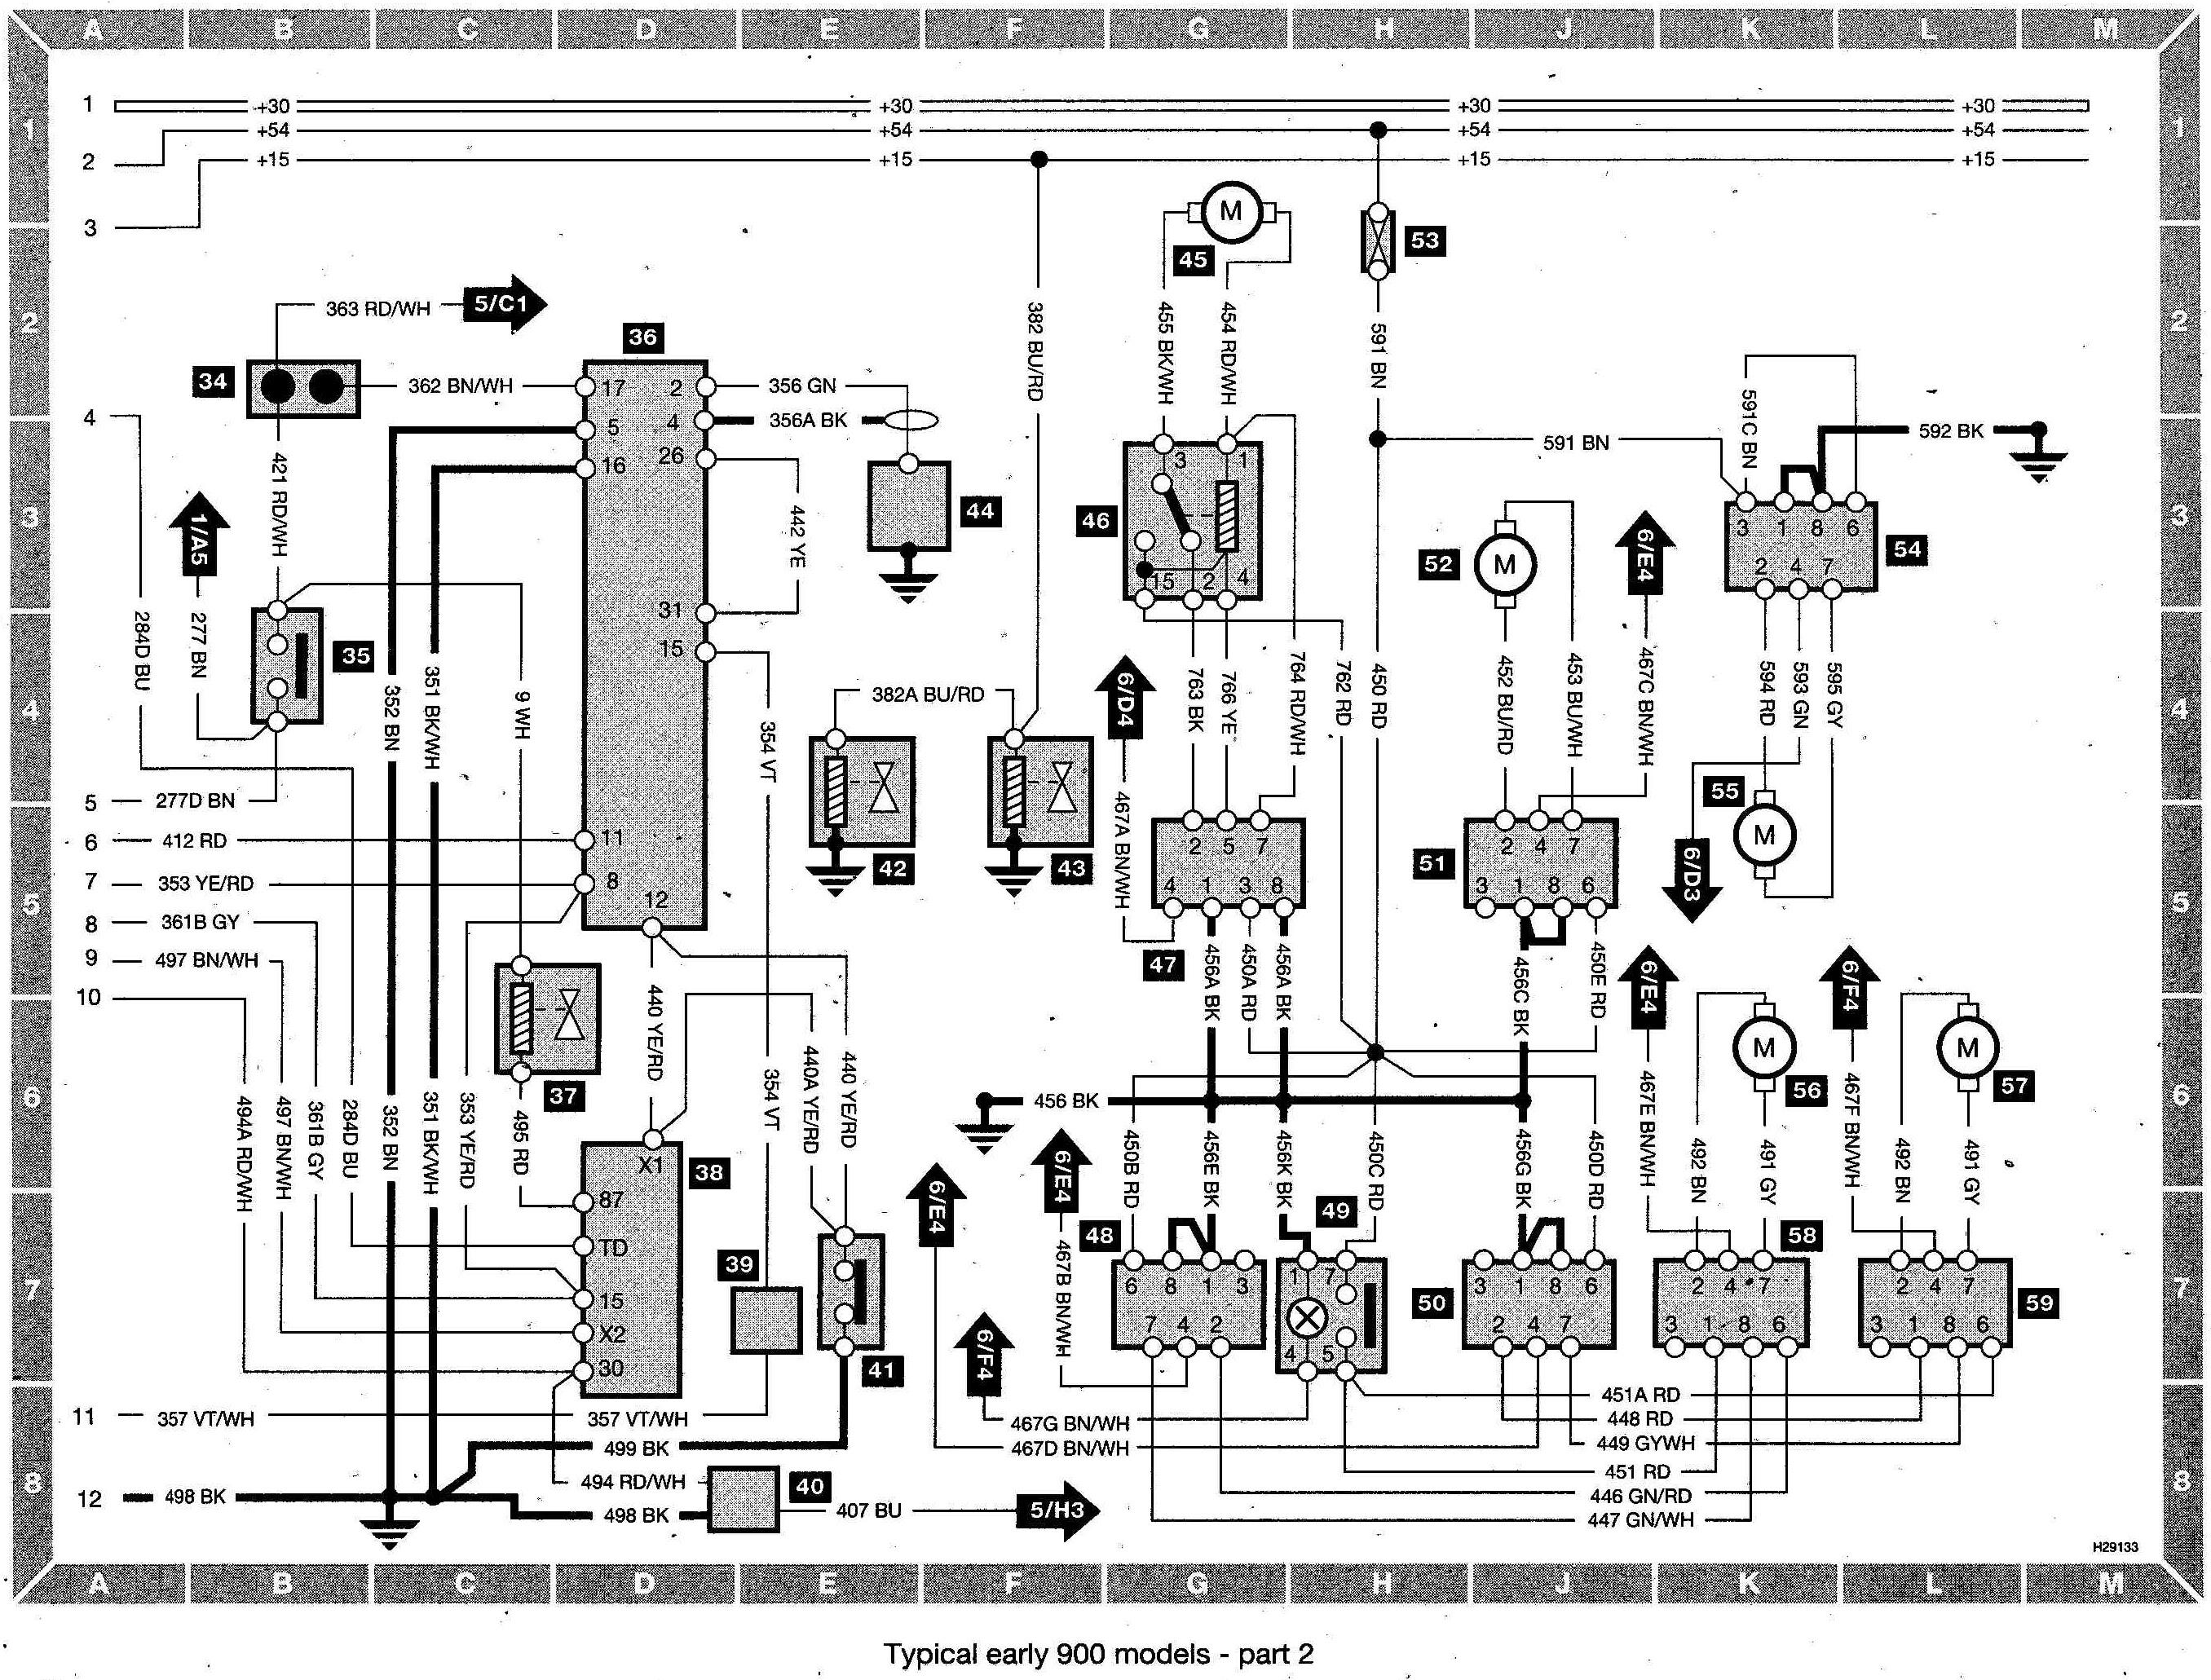 Astonishing Stewart Warner Tachometer Wiring Basic Electronics Wiring Diagram Wiring Cloud Onicaalyptbenolwigegmohammedshrineorg